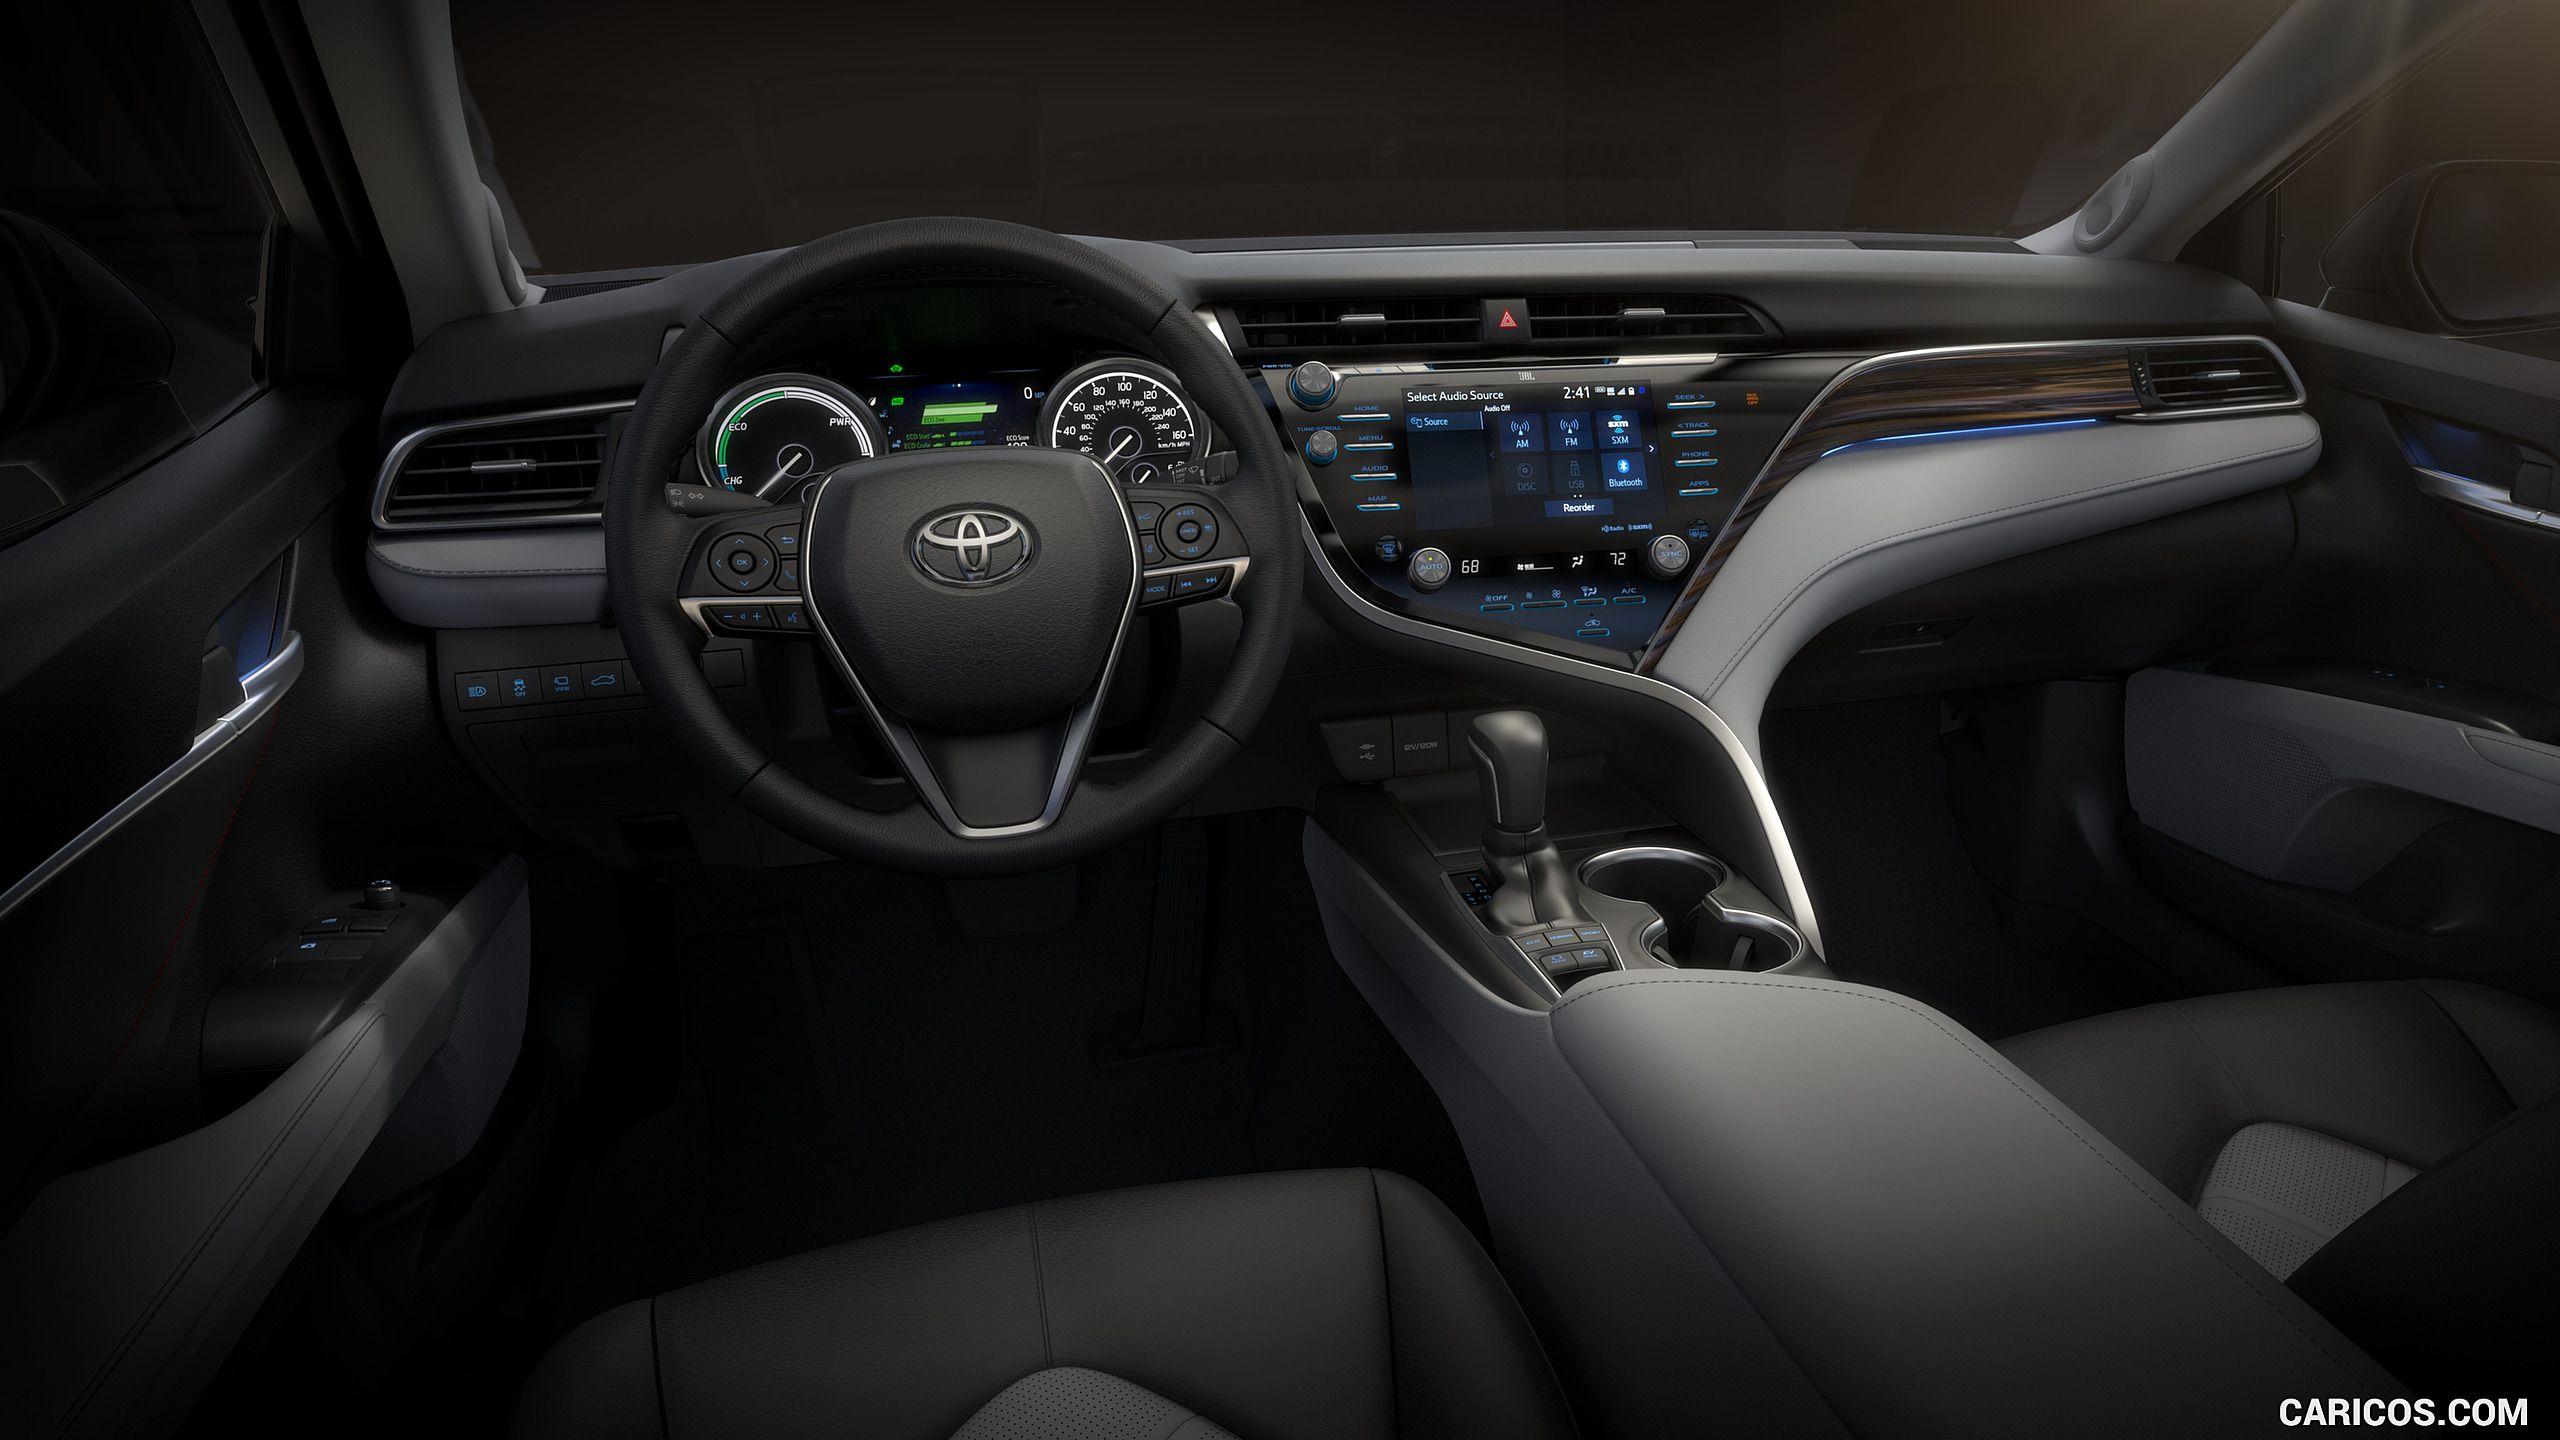 Toyota Camry 2018 Interior >> 2018 Toyota Camry Xse Interior Cockpit Hd Toyota Camry